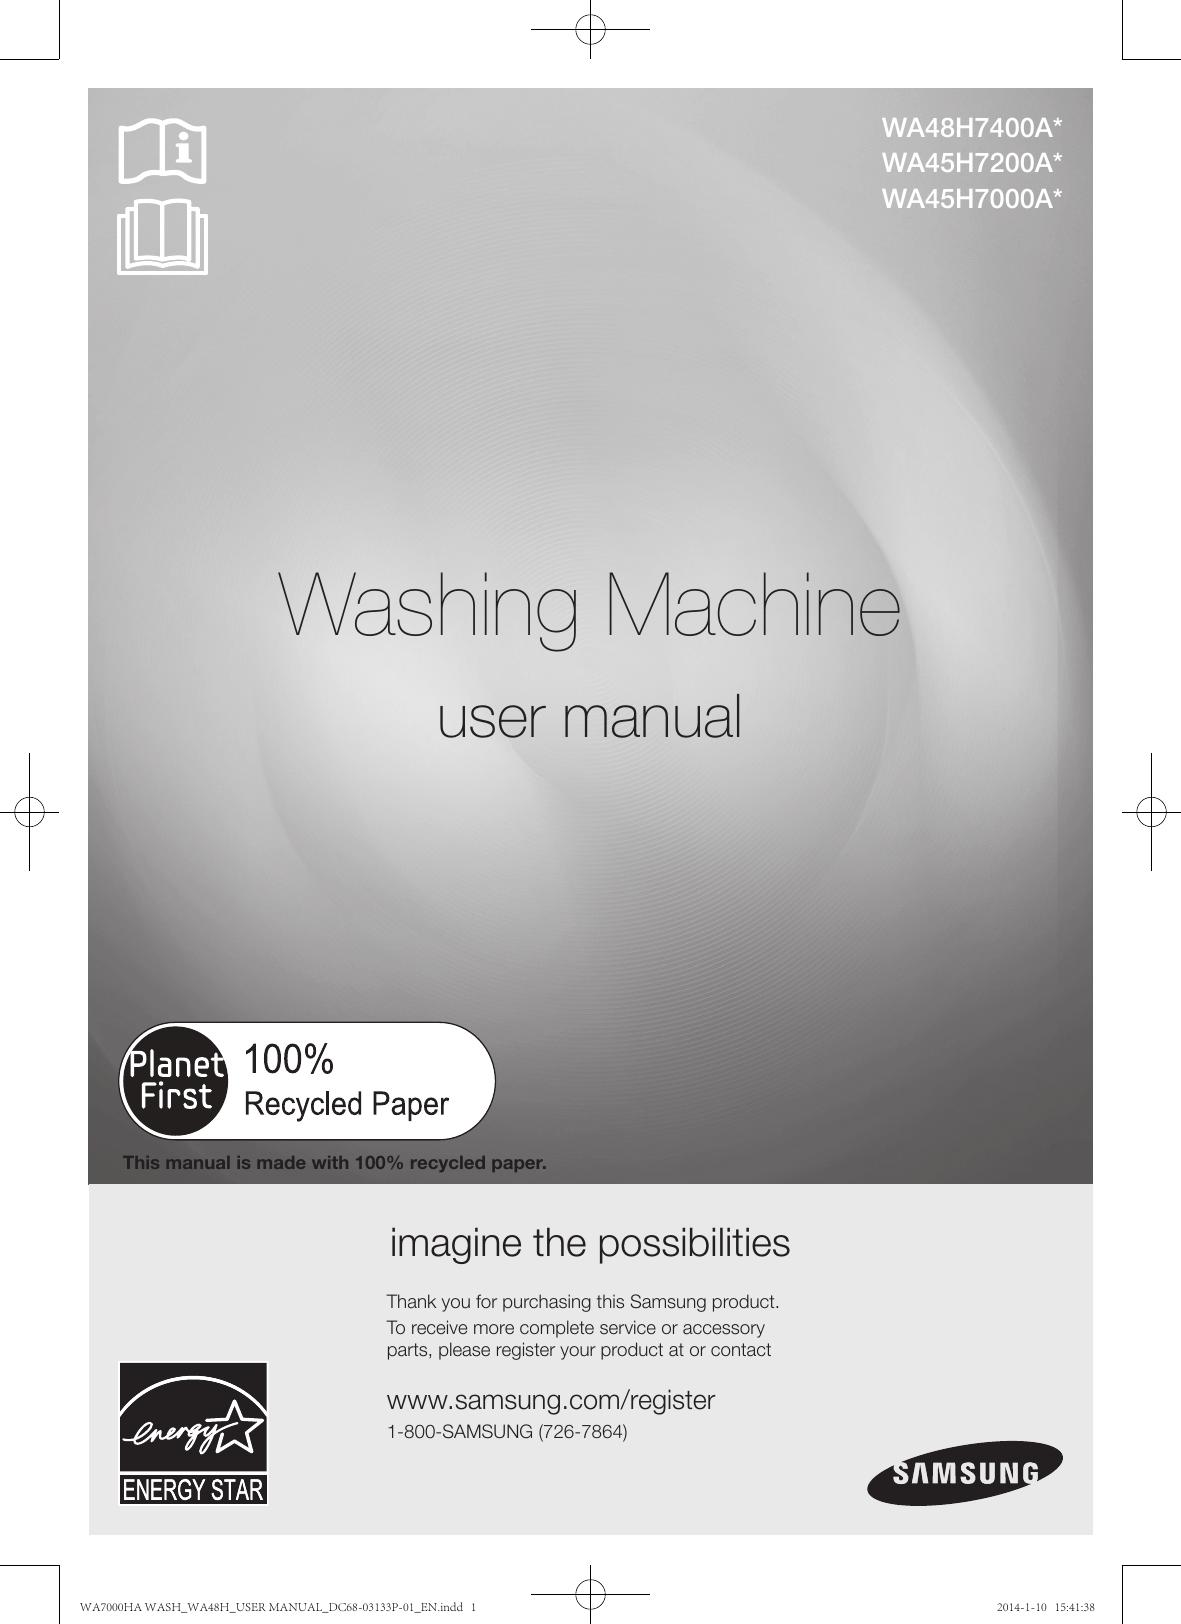 Samsung WA48H7400AW A2 Washing Machine Service Manual /& Repair Guide